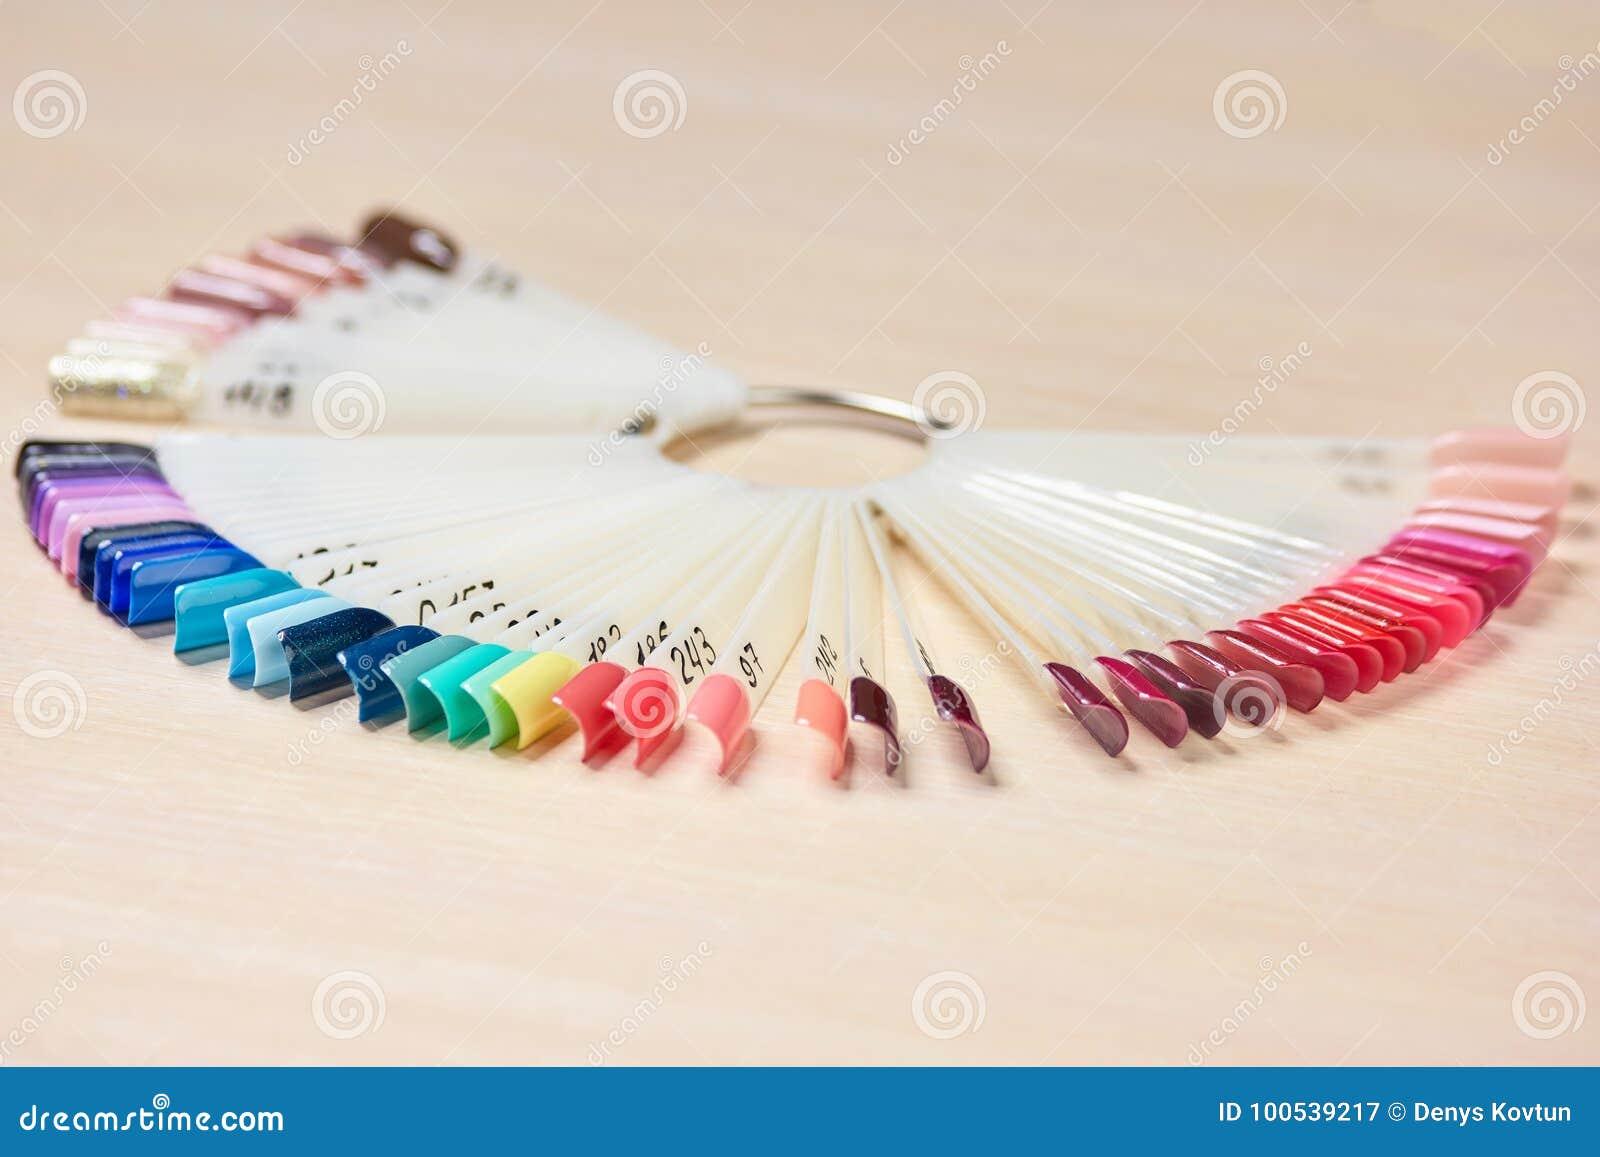 Samples Of Color Nail Polish Stock Image Image Of Amount Choice